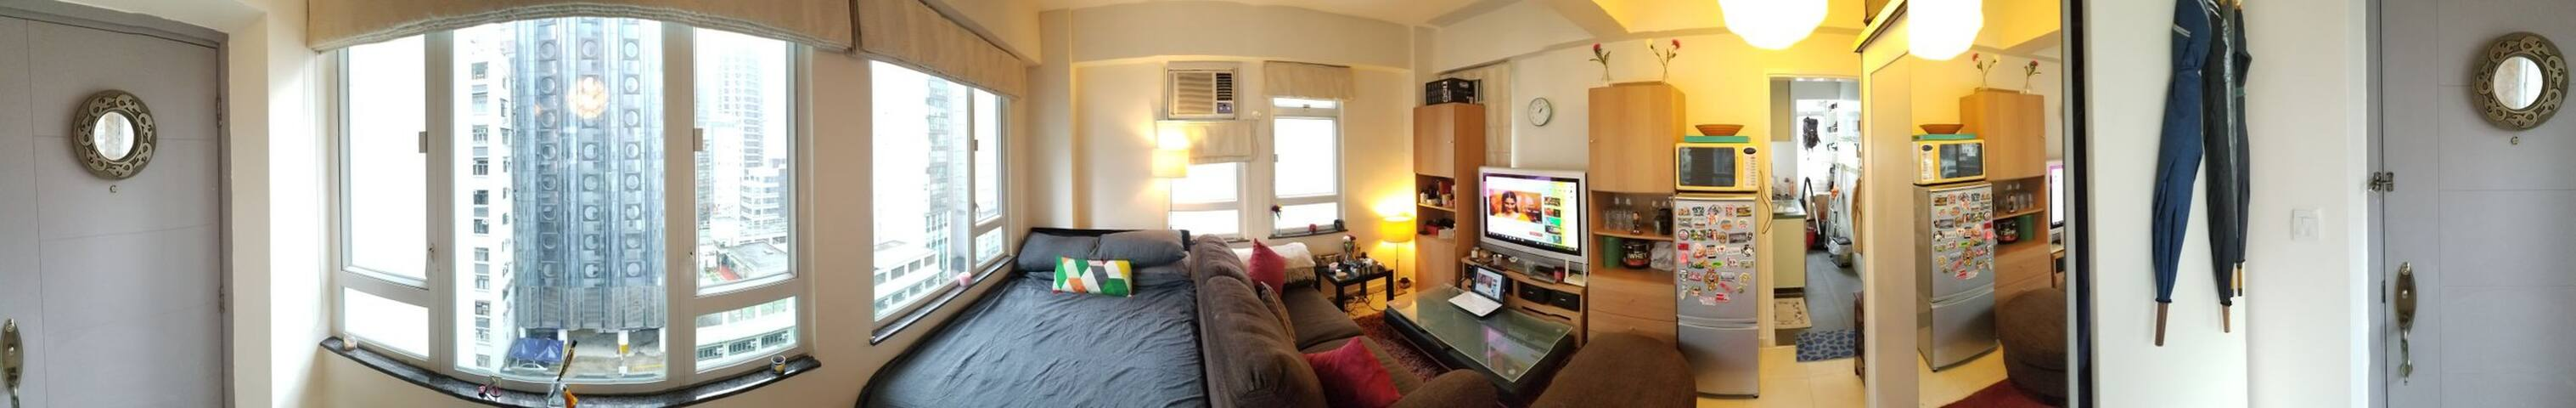 Cool Cozy Studio | Awesome location | Urban Views